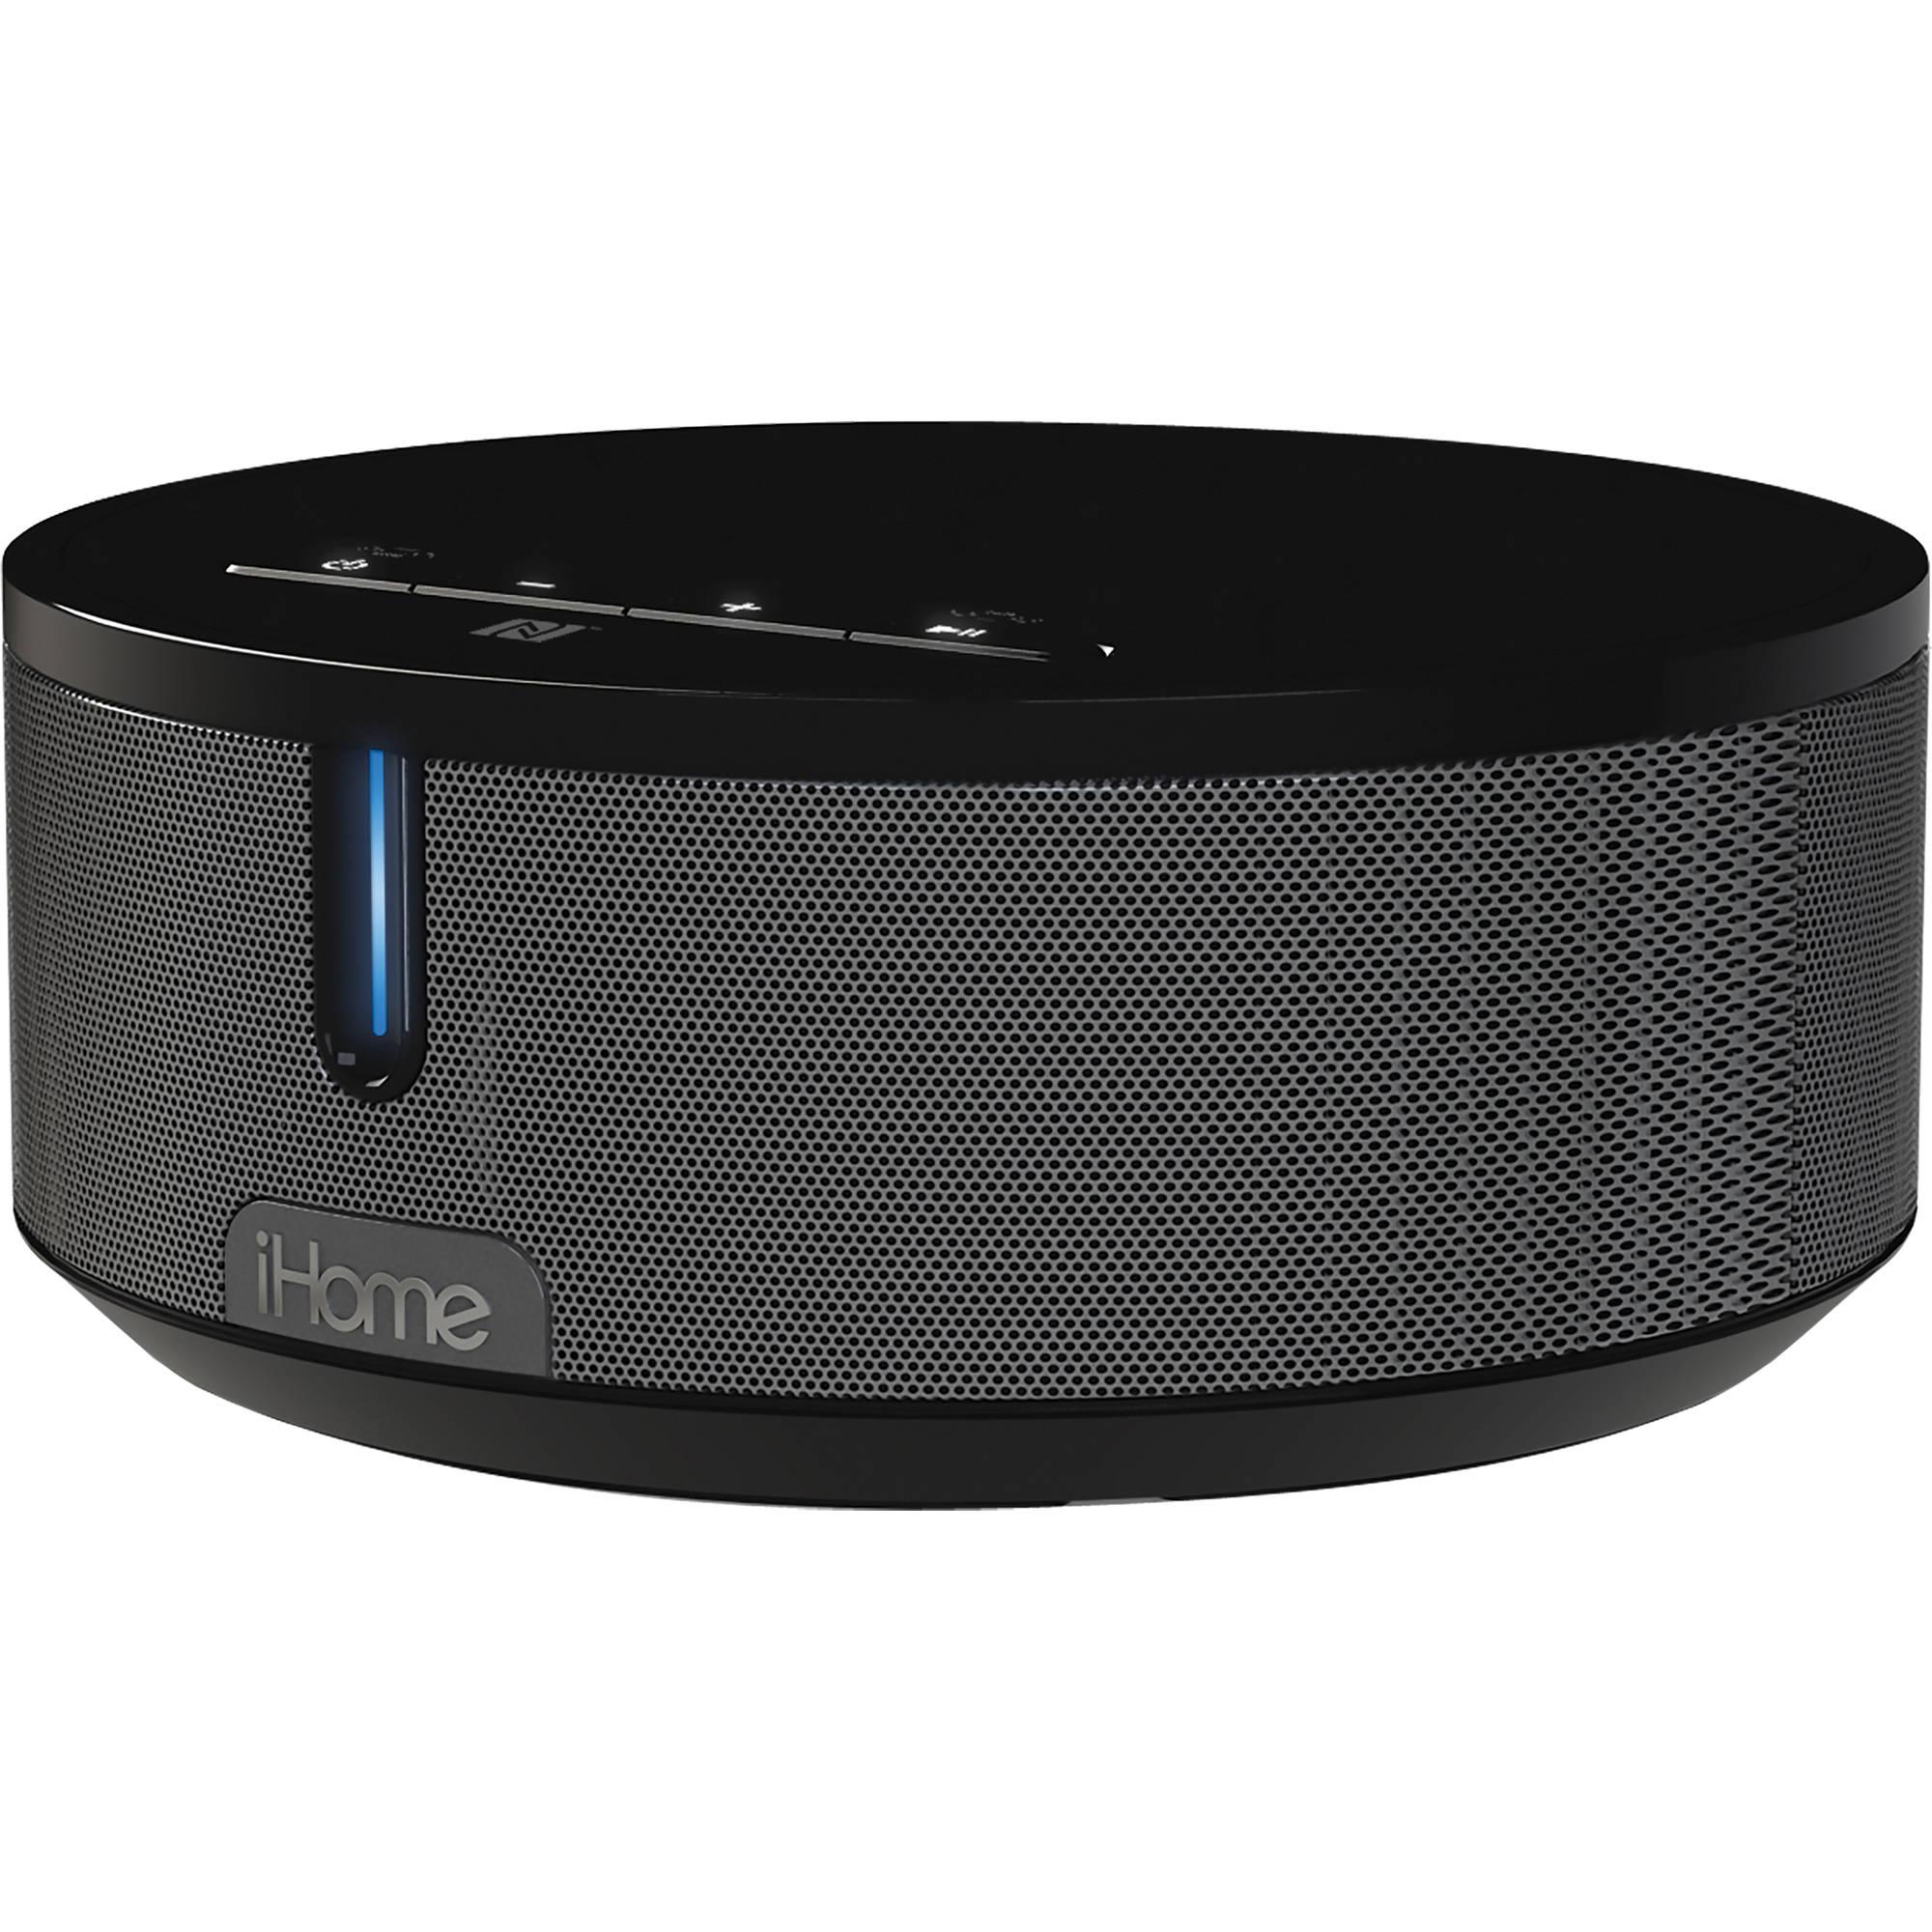 Ihome Ibn26 Bluetooth Stereo Speaker System Black